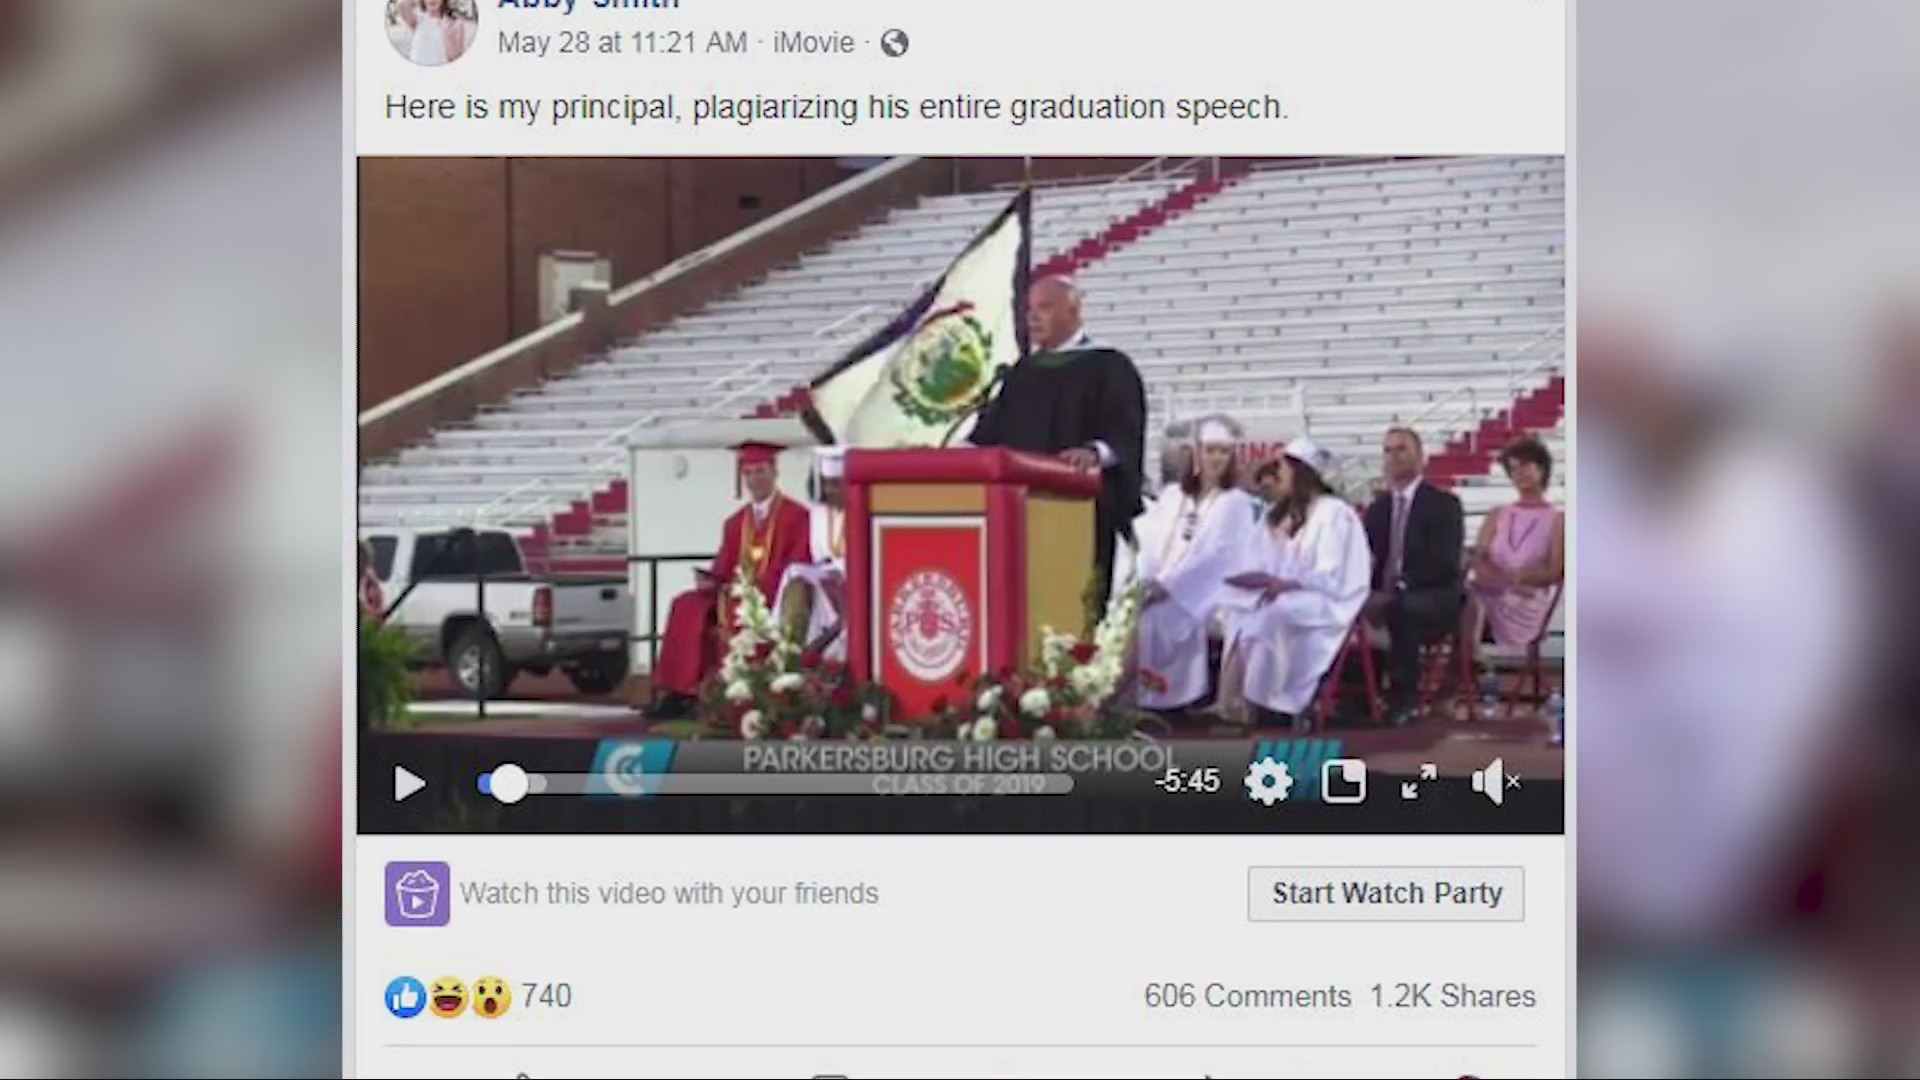 Parkersburg Student Accuses Principal of Plagiarizing Graduation Speech